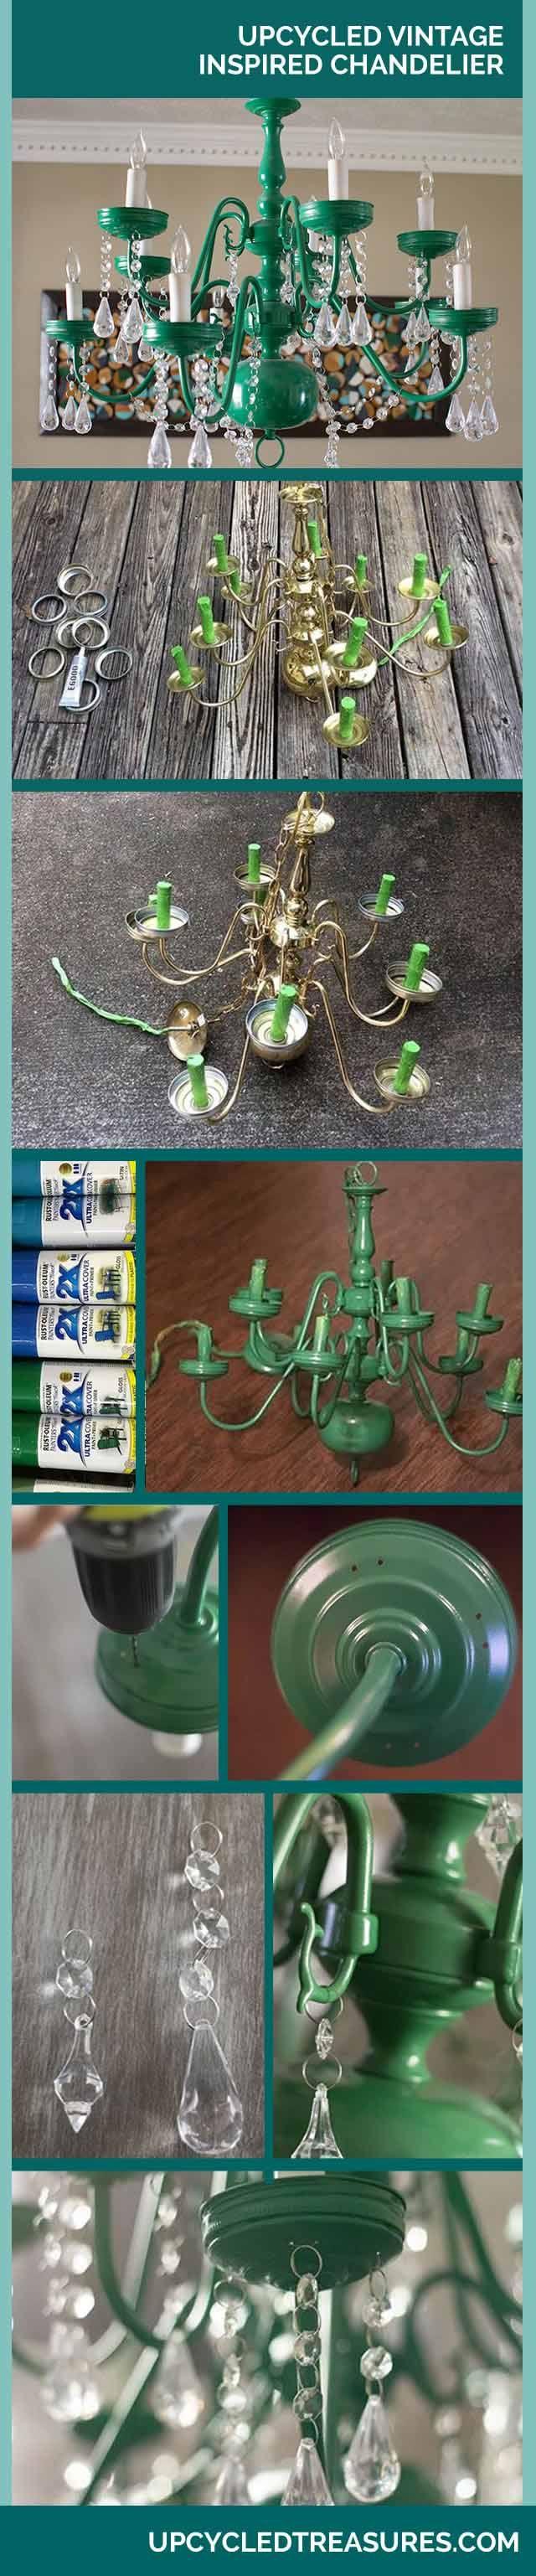 use solar lights, still get sun and protected by jars  DIY Mason Jar Chandelier - Vintage Home Decor Ideas